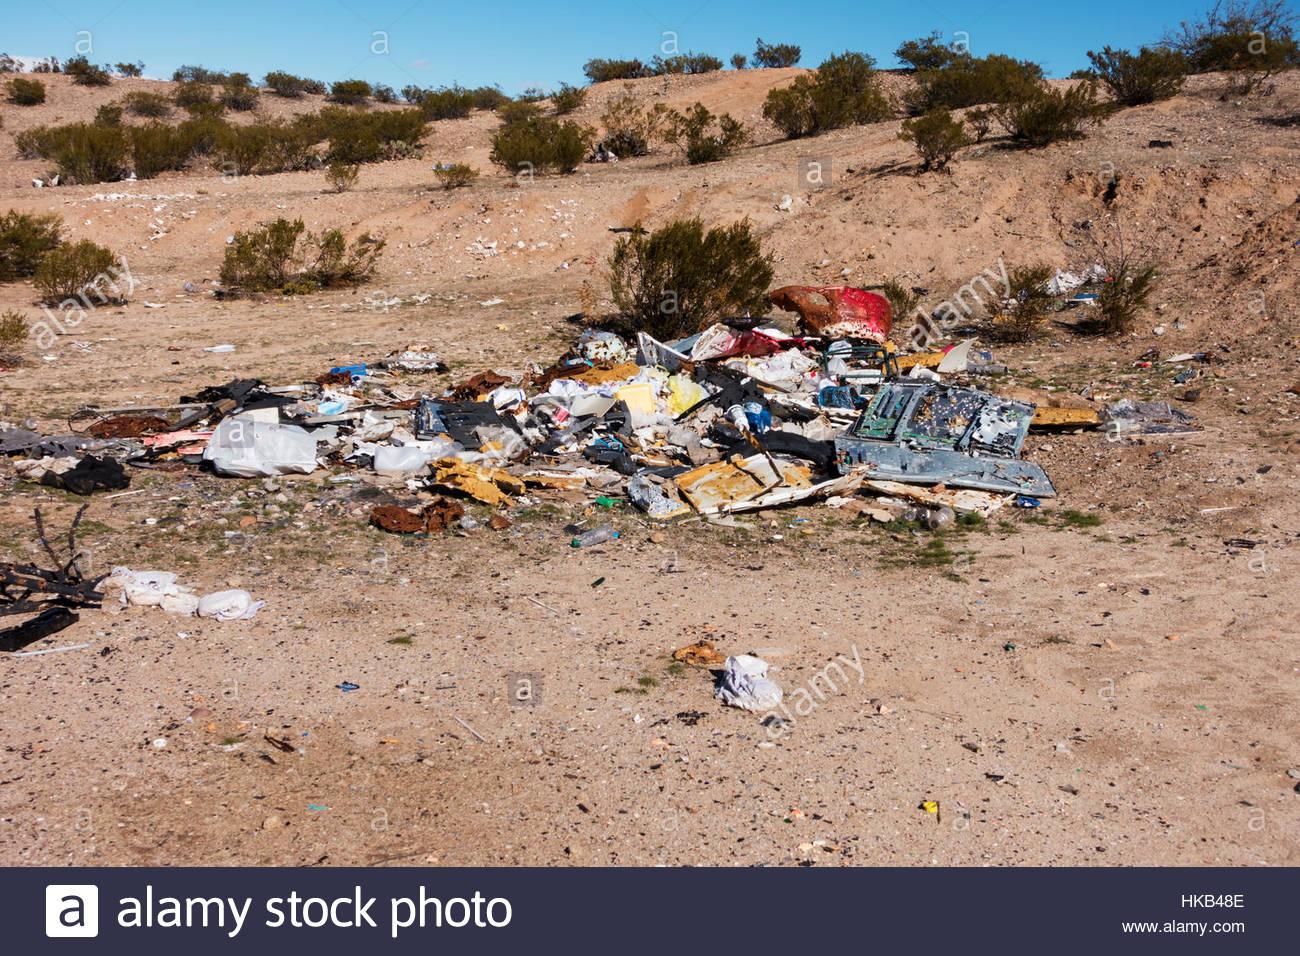 Trash illegal dumping in desert Arizona - Stock Image